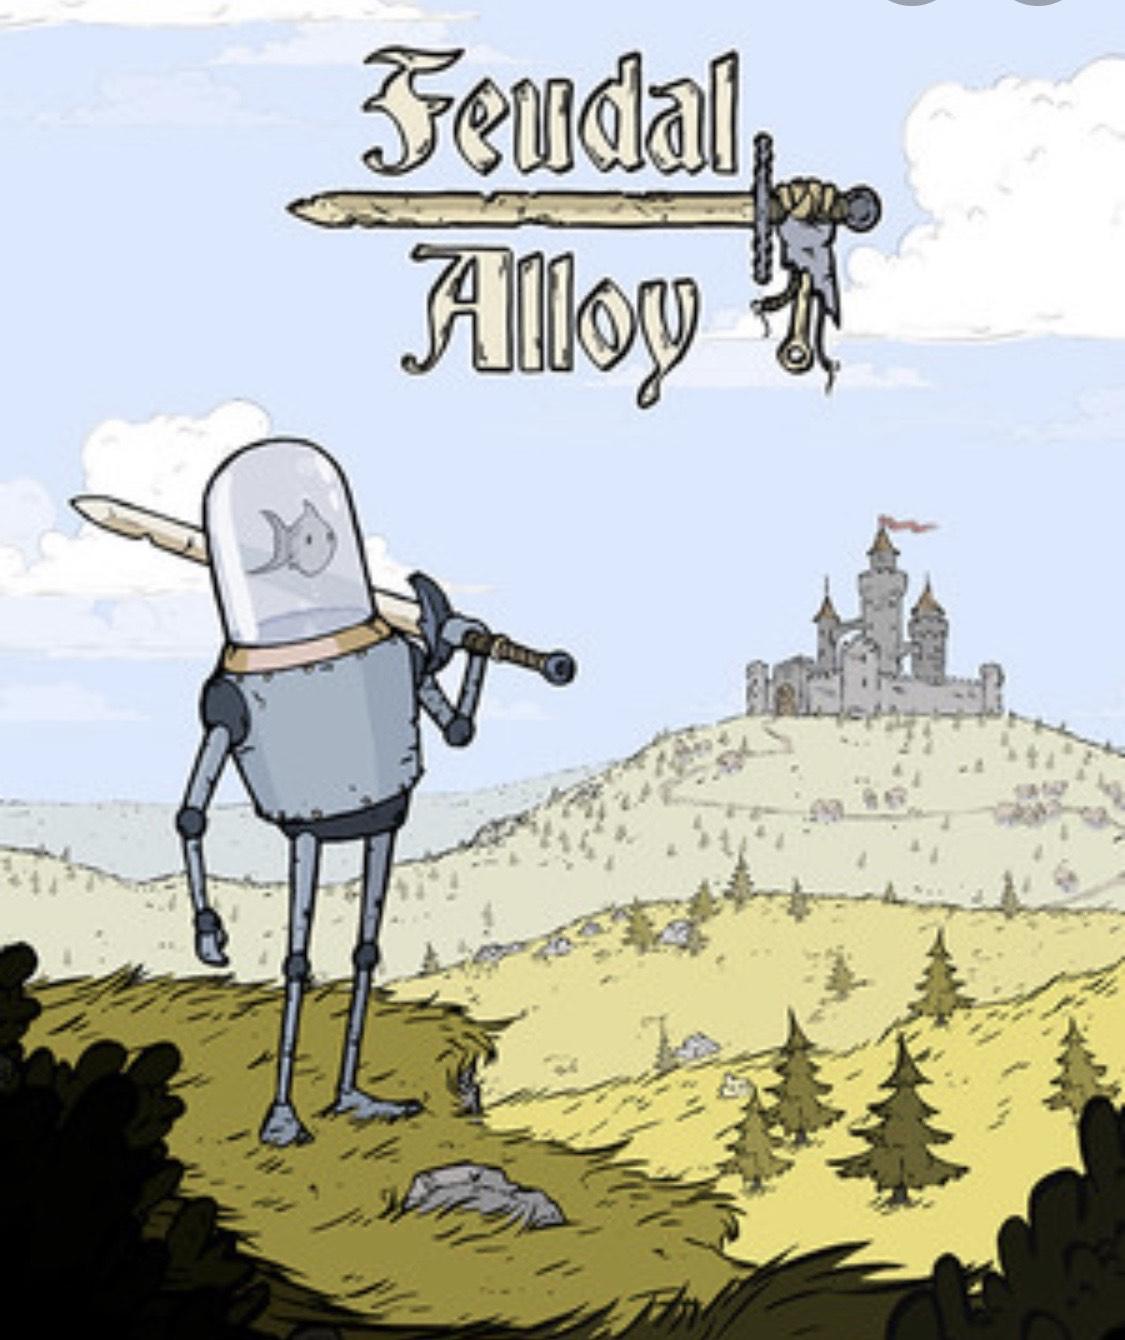 Feudal Alloy (80% Off) - Nintendo Switch - Eshop for £2.69